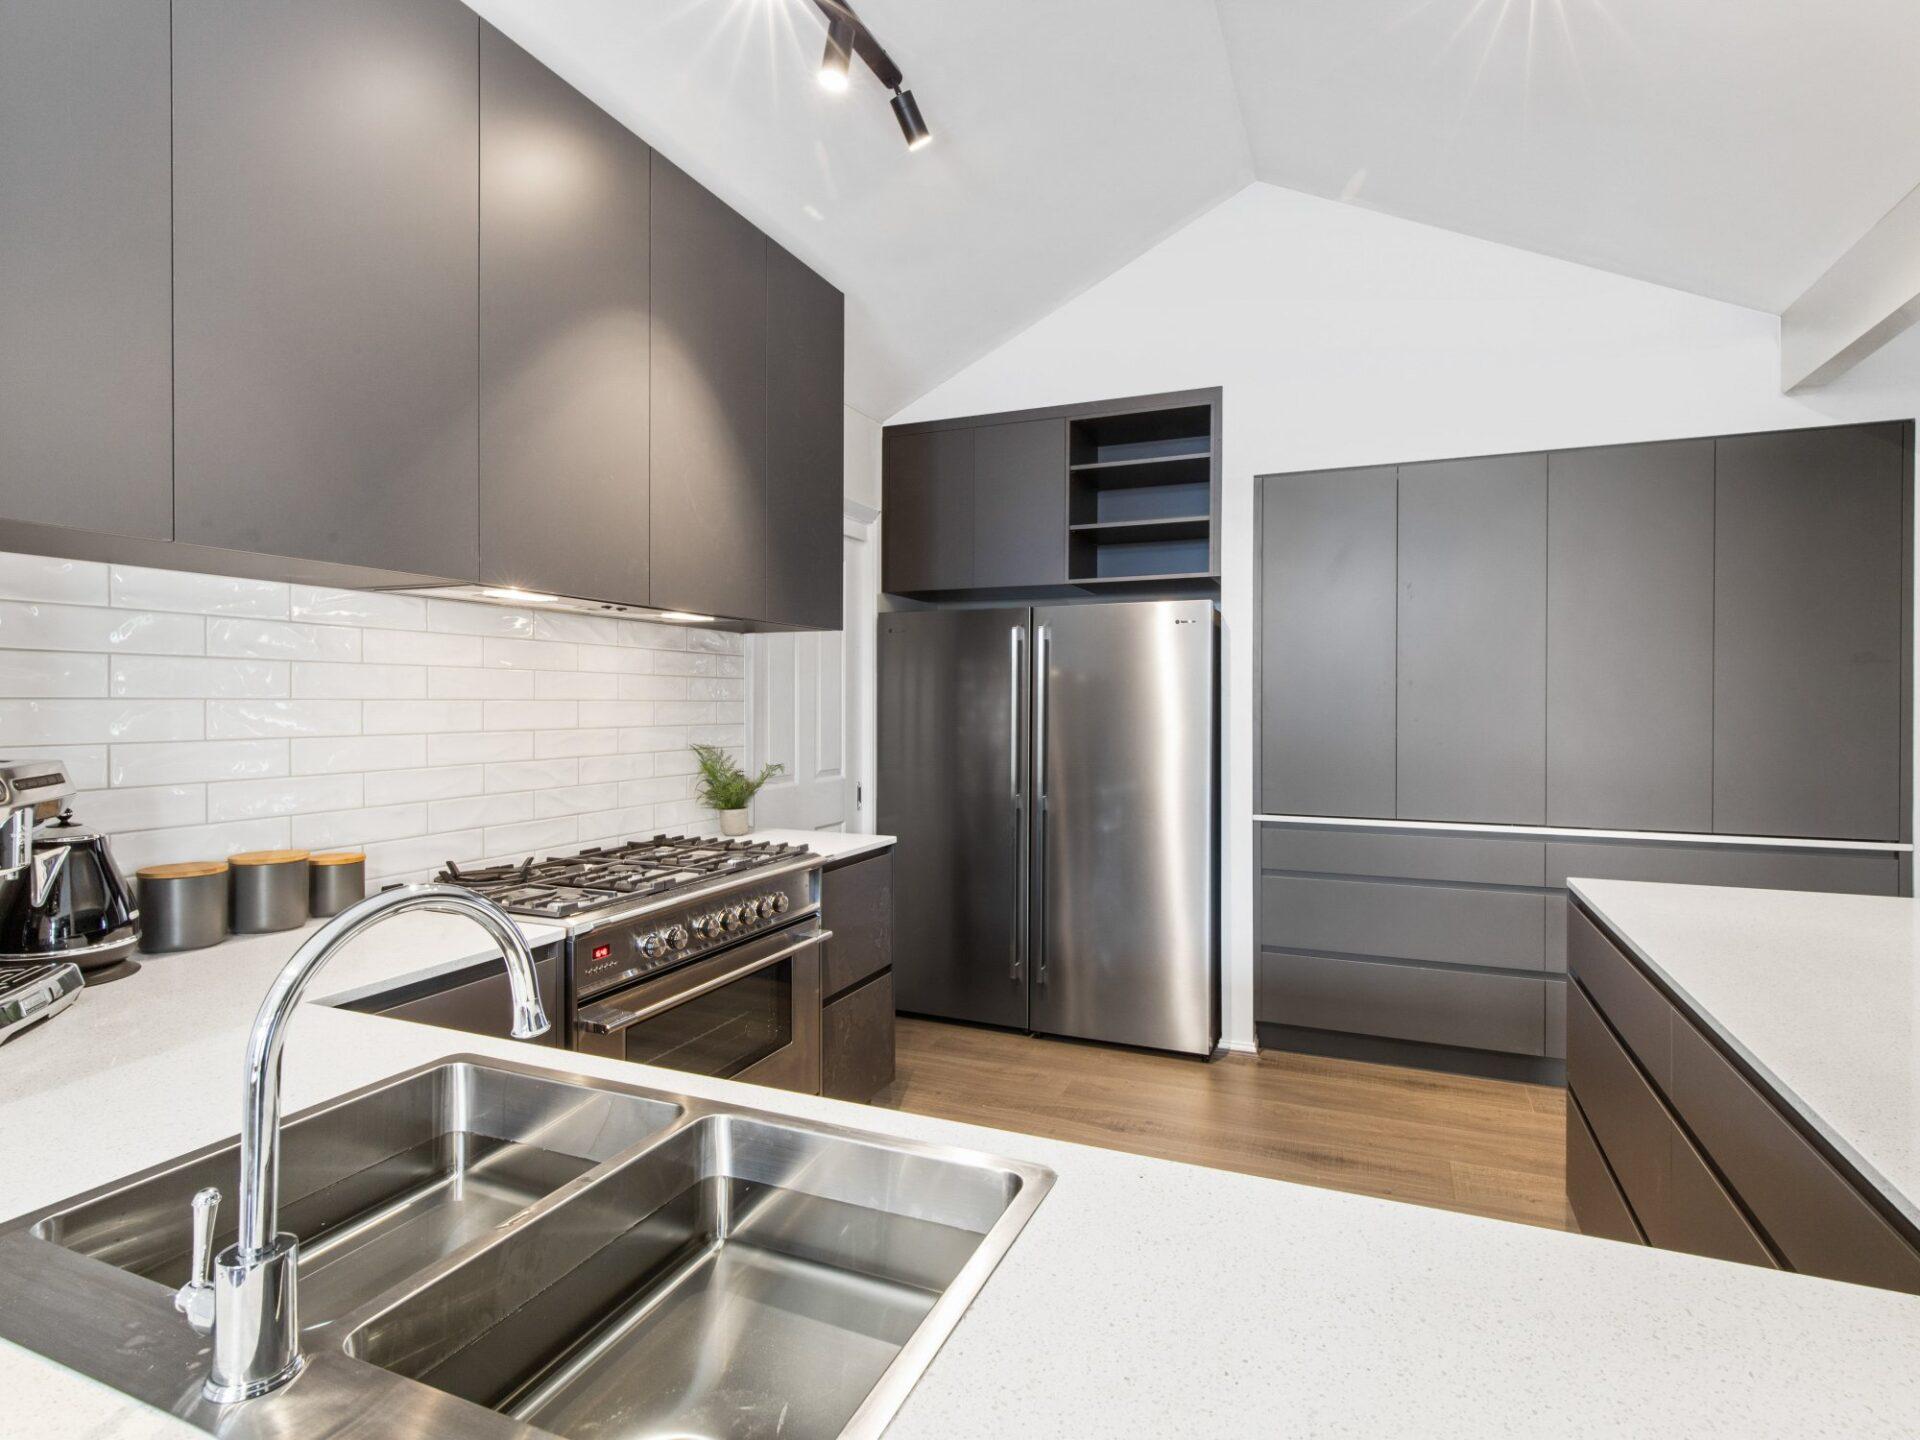 Kitchen Storage Renovations - Bayview Renovations